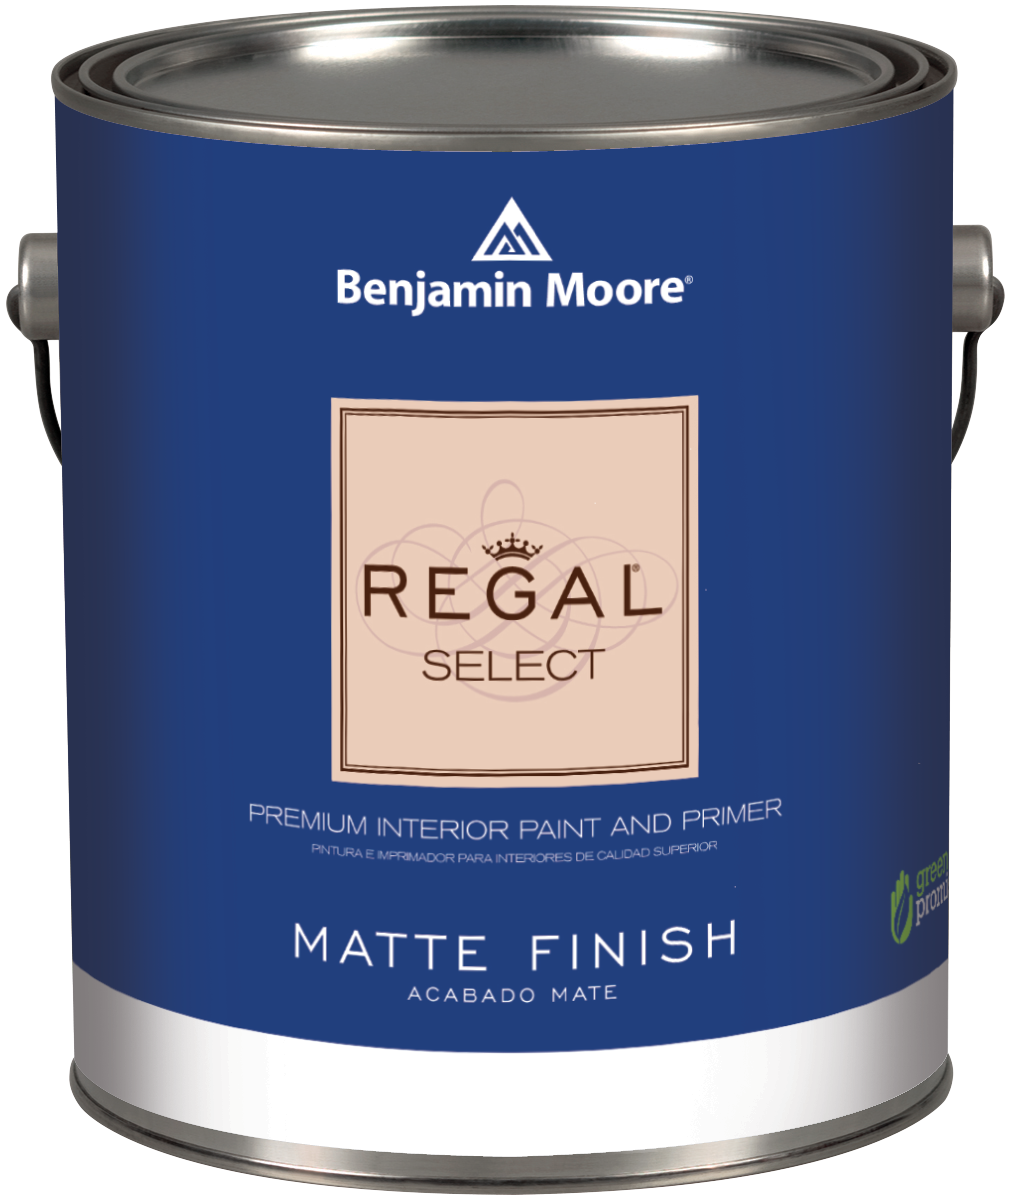 benjamin moore regal select waterborne interior paint | thybony